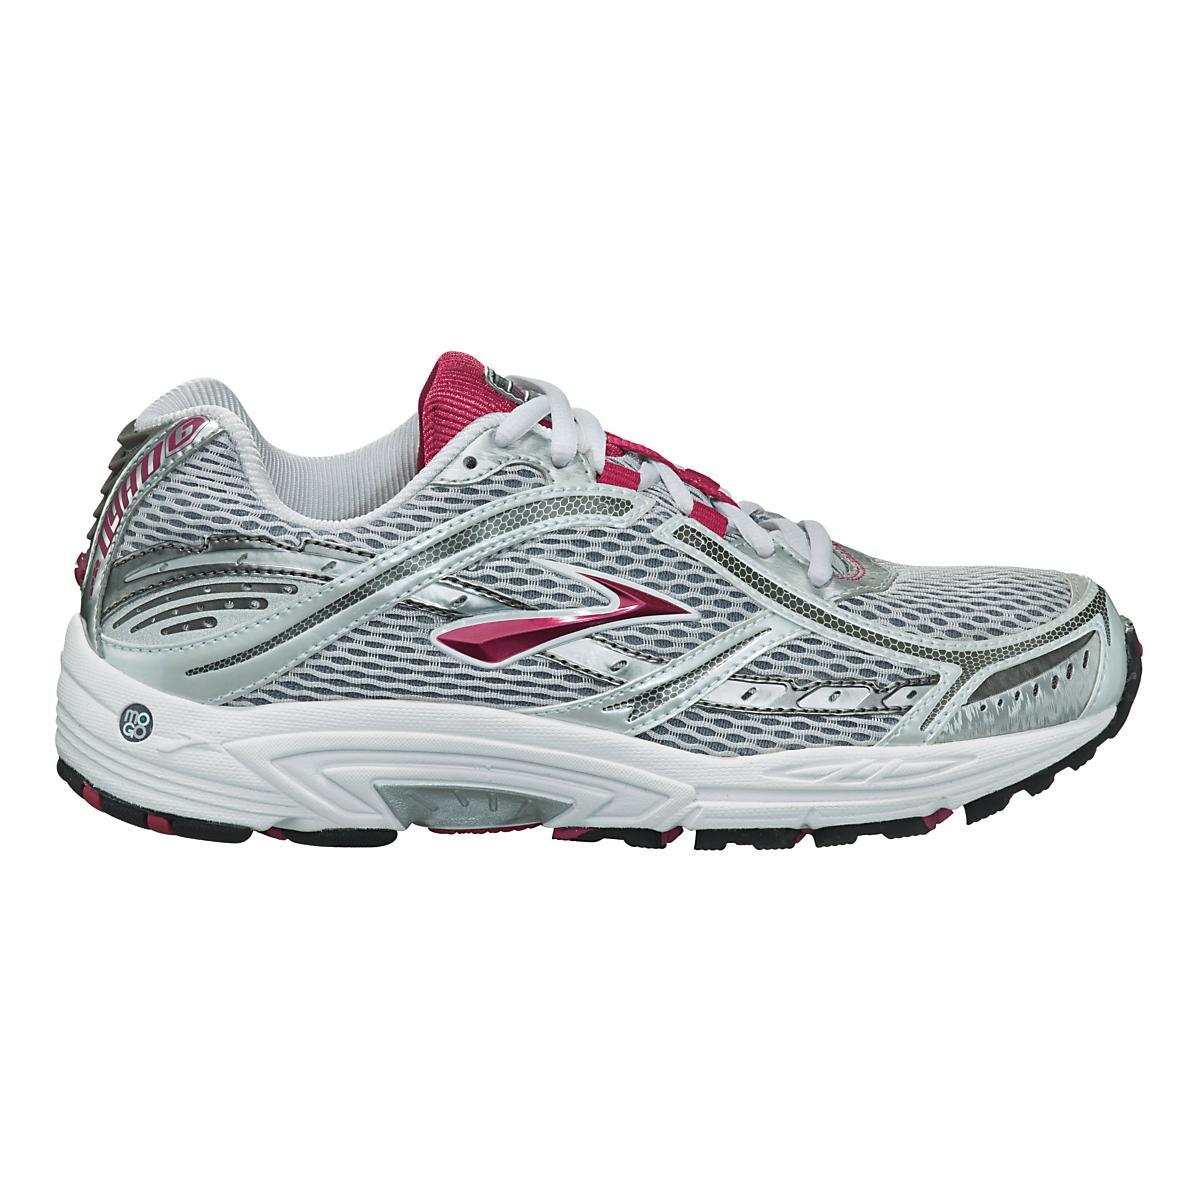 1f5c0970e46ac Womens Brooks Dyad 6 Running Shoe at Road Runner Sports